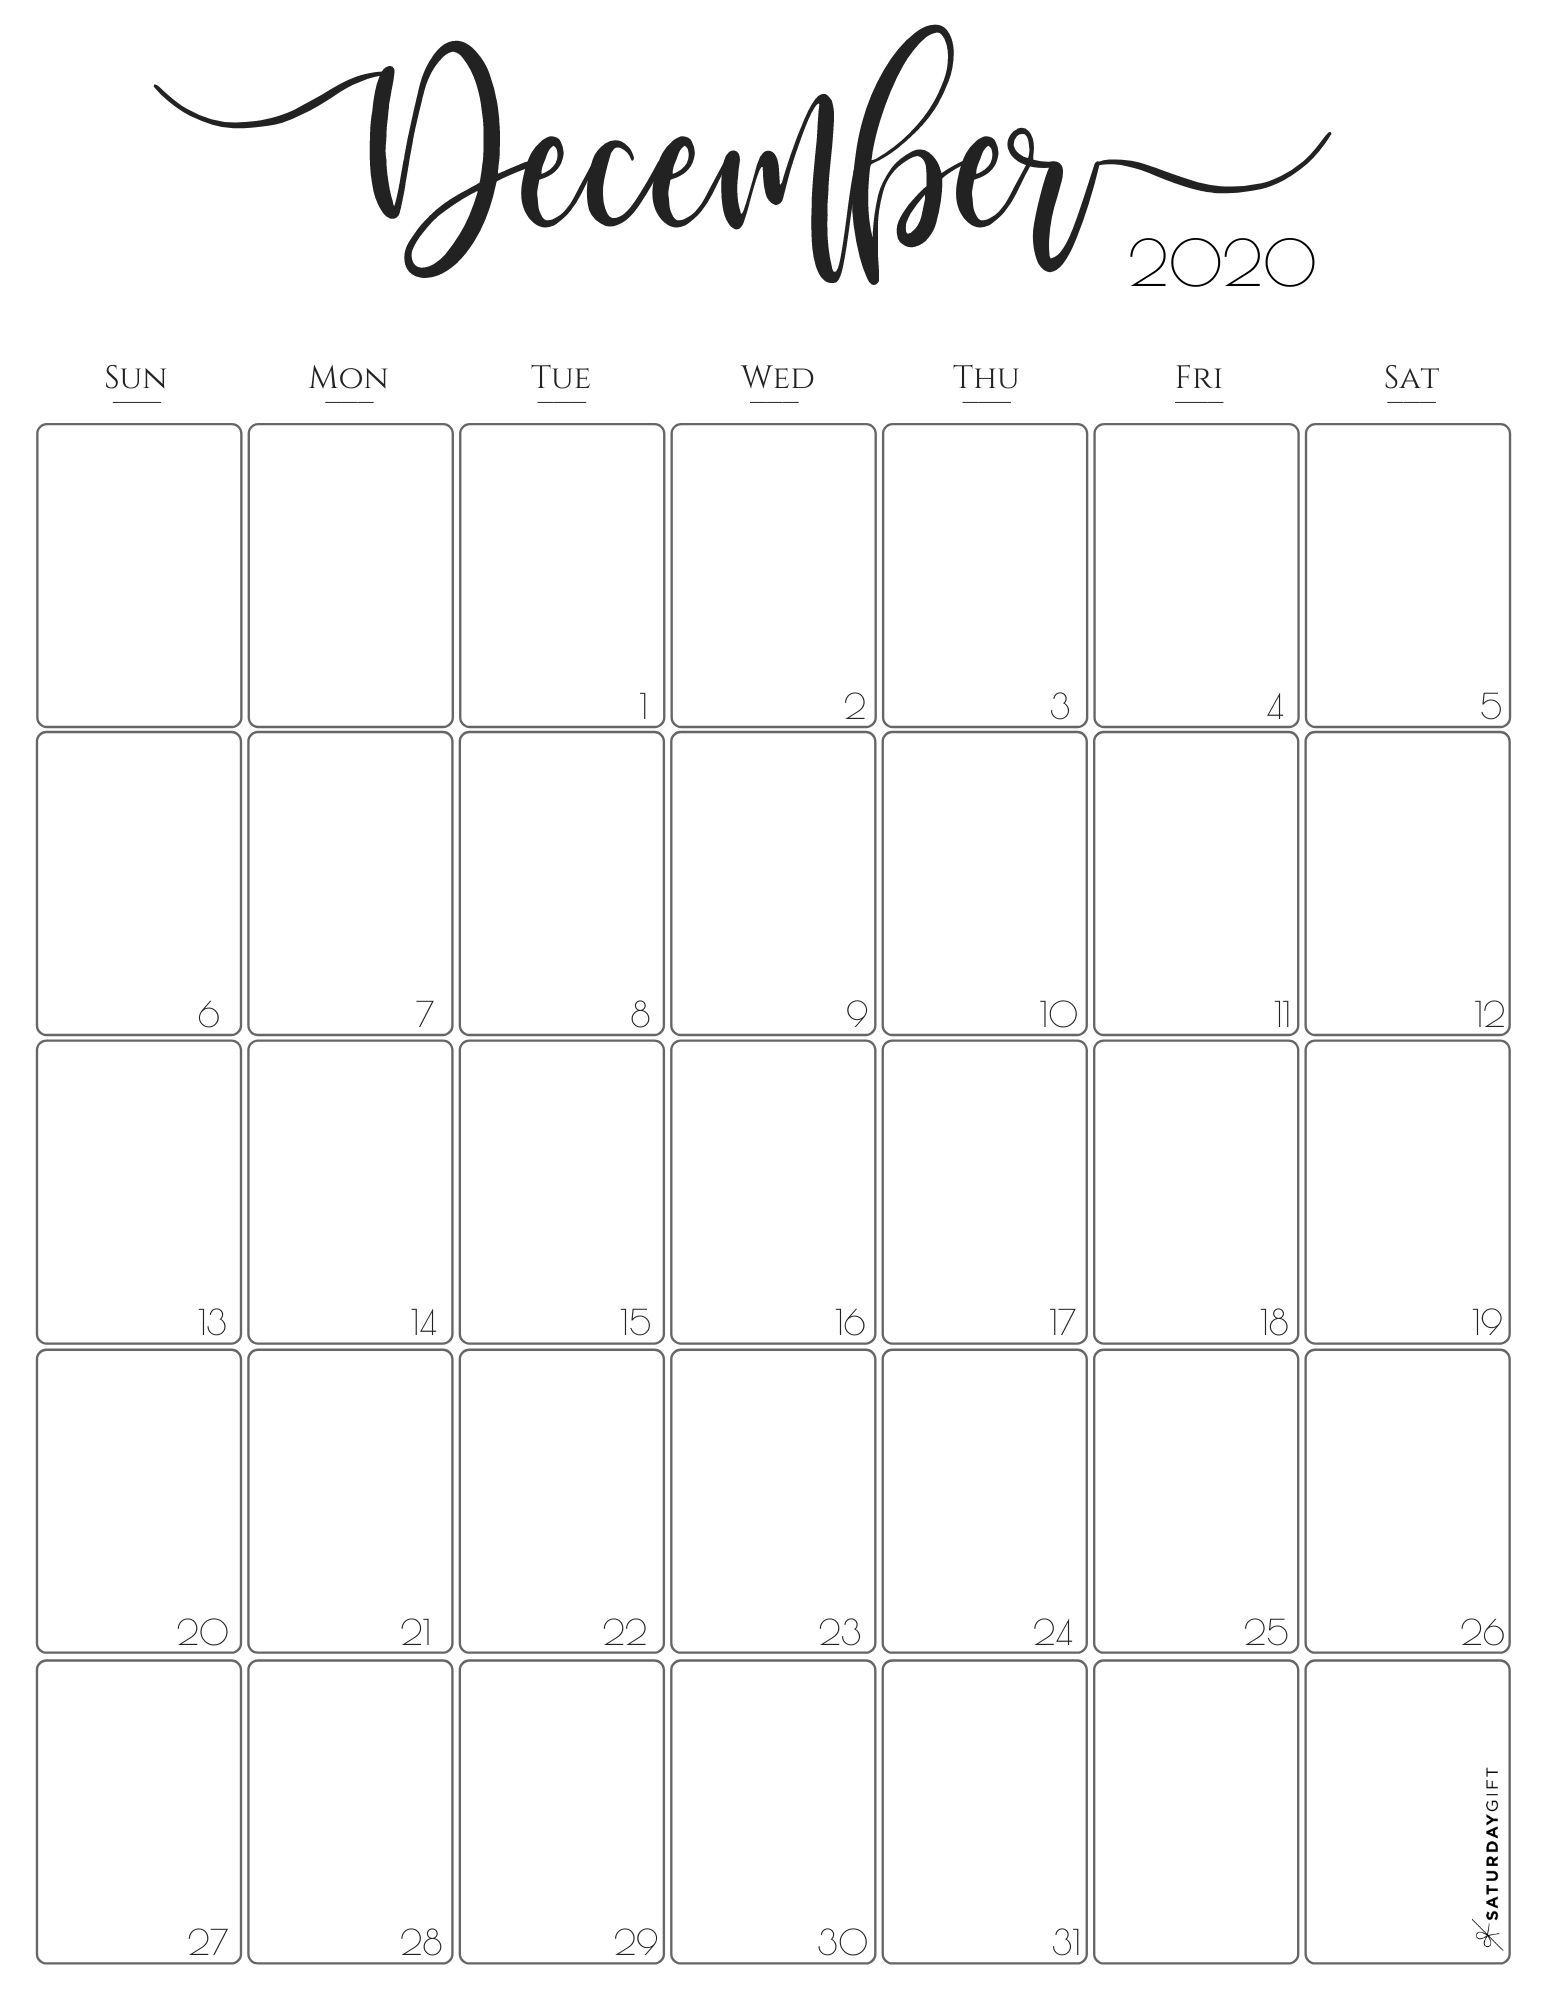 Get 2021 Free Printable Calendar August Through Decemeber